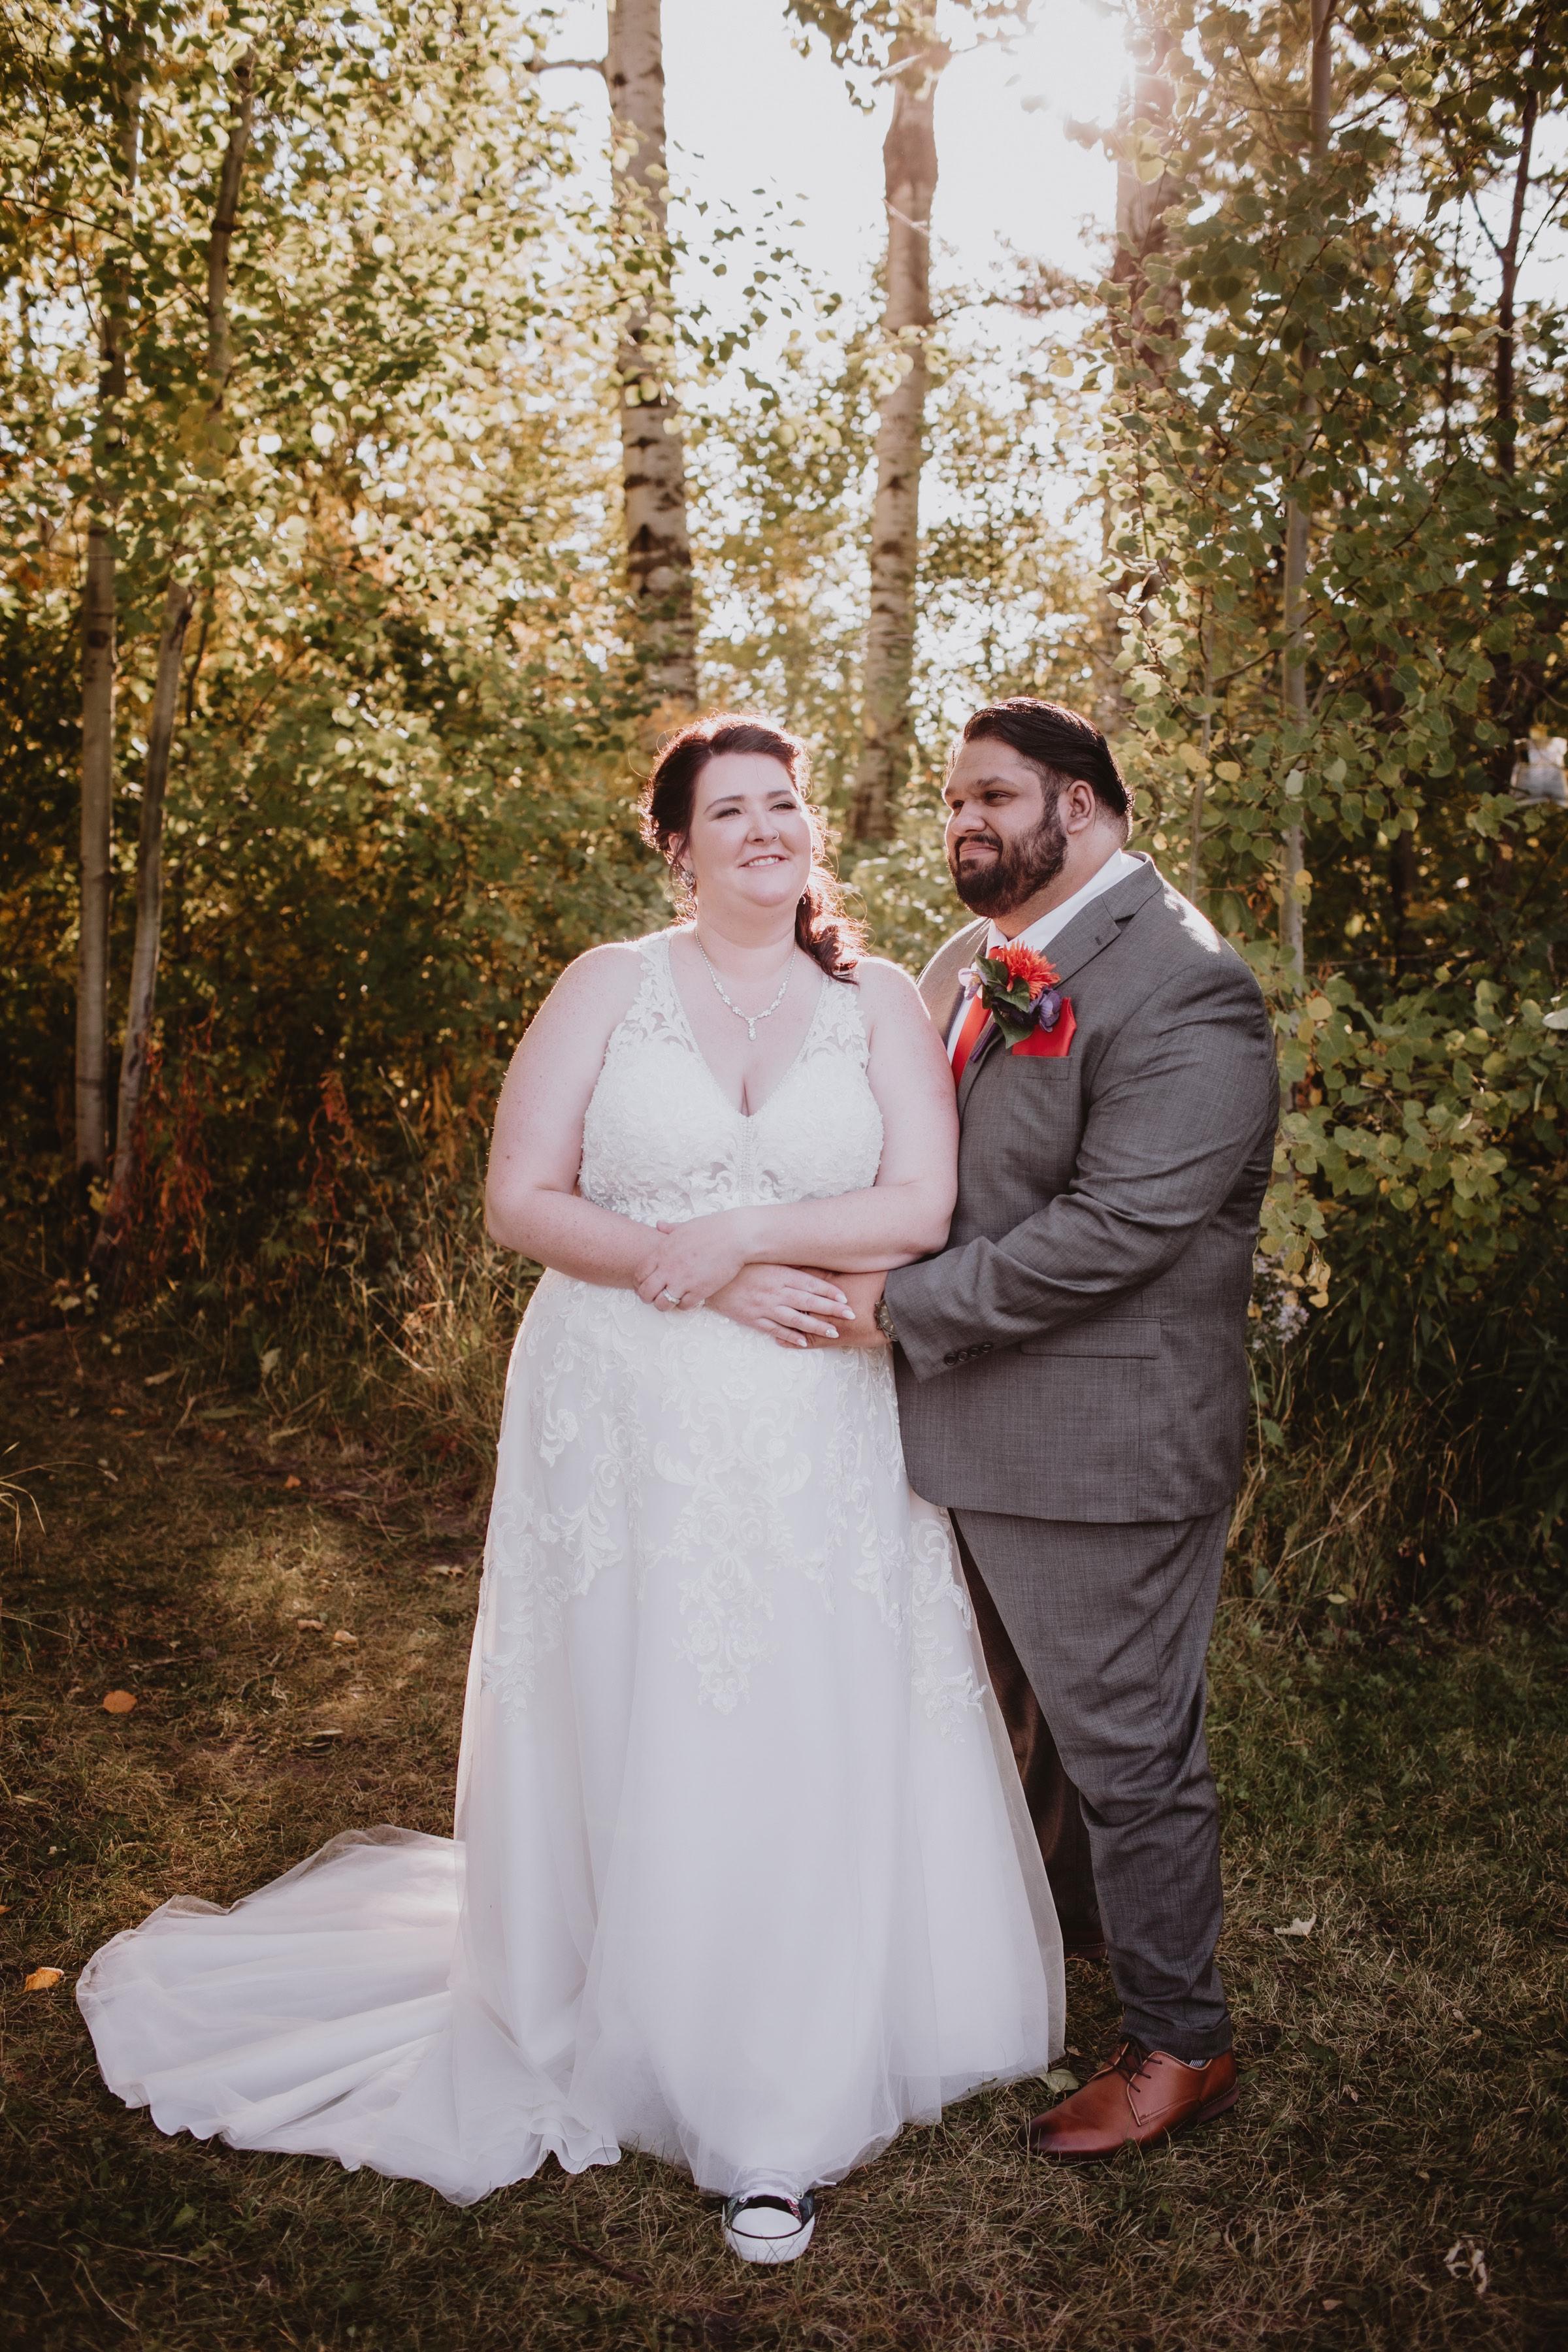 Smiling Wedding Couple poses for wedding portrait in Elma, Manitoba.